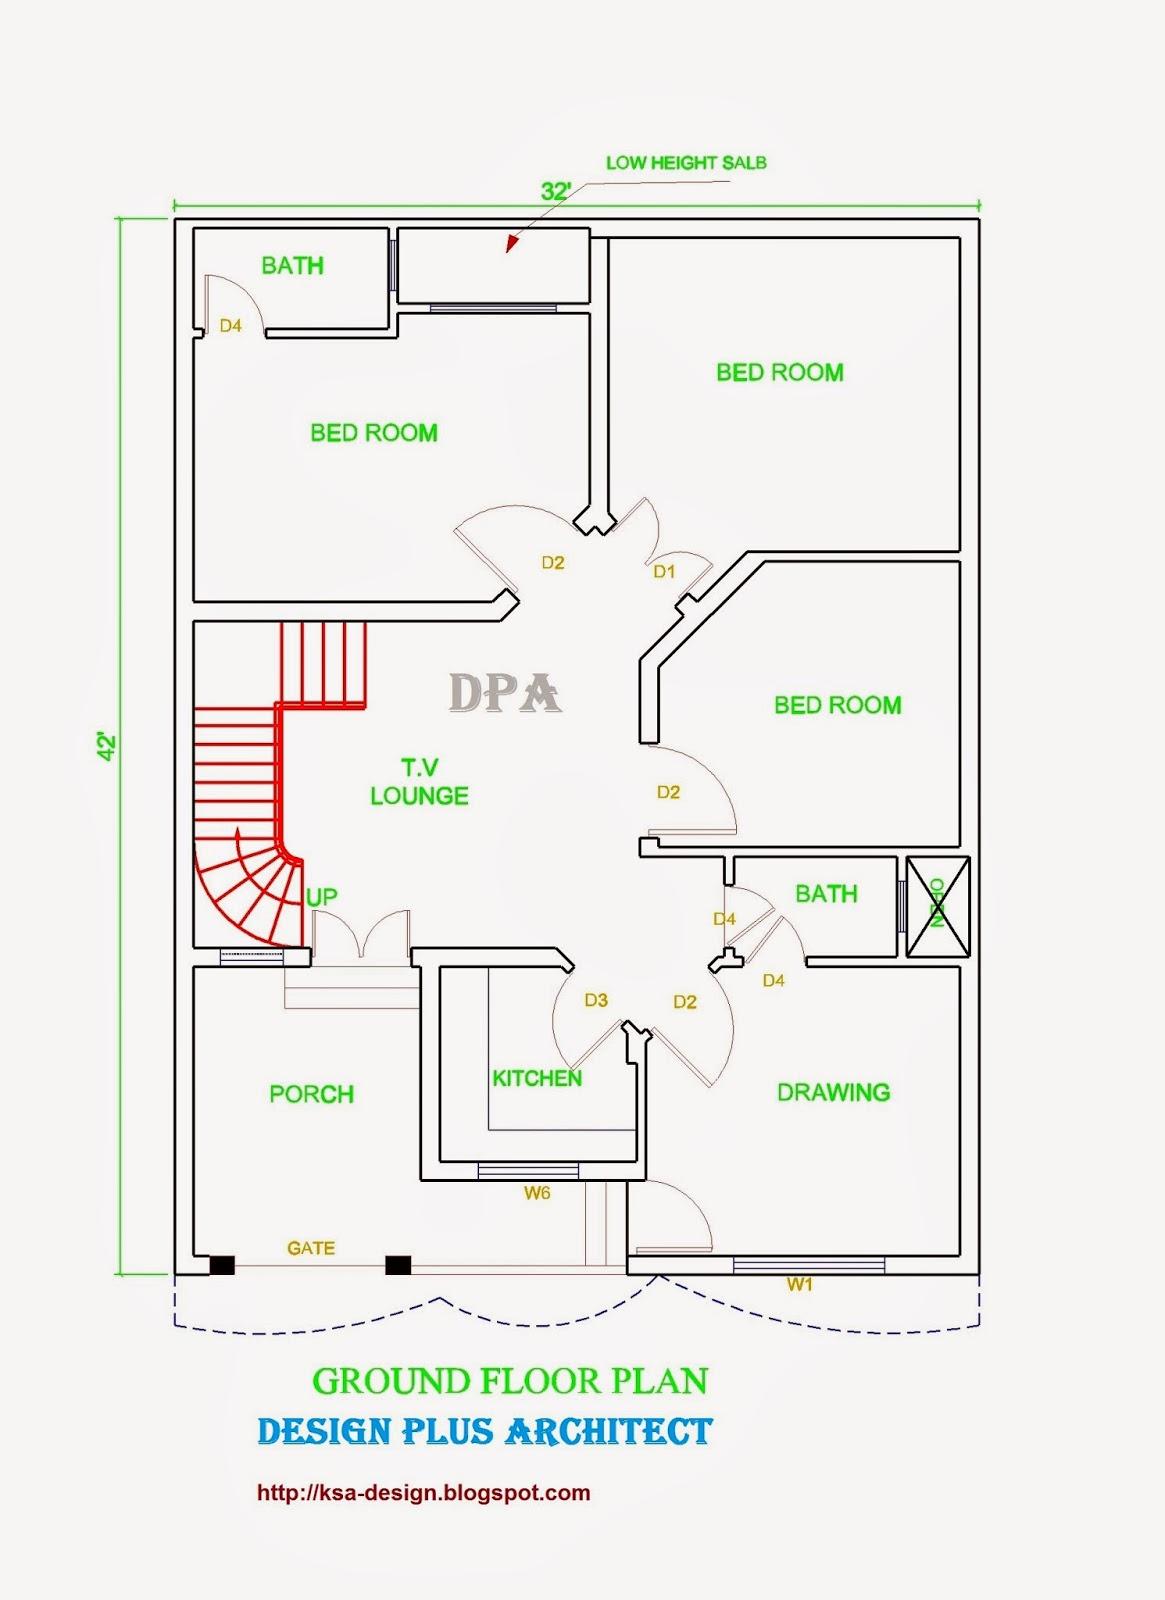 Home plans in pakistan home decor architect designer home 2d plan - Home design blueprint ...